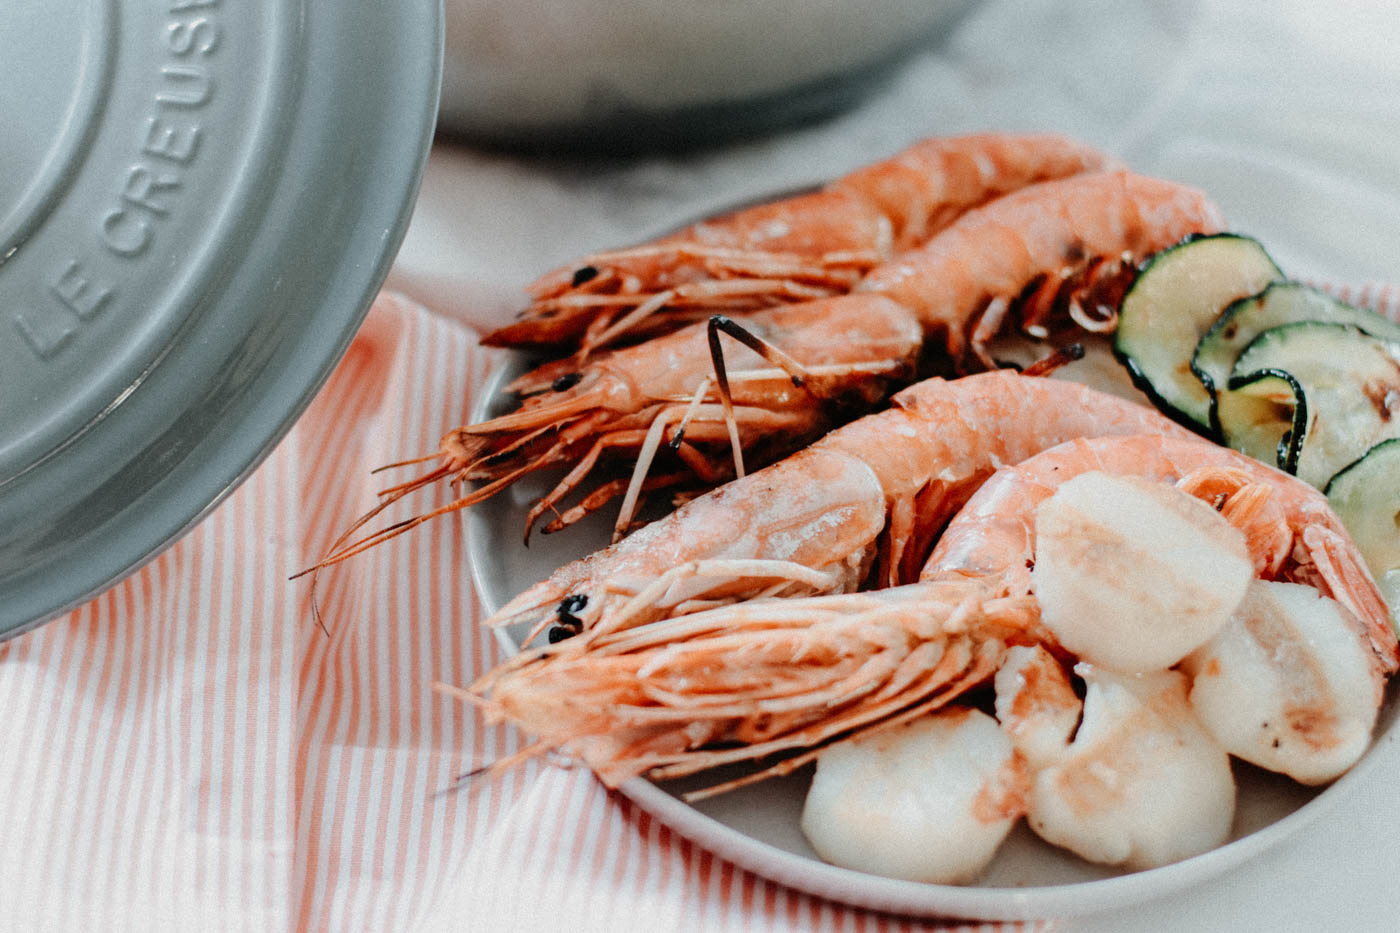 Zucchini Risotto - Courgette Risotto with Shrimps 3